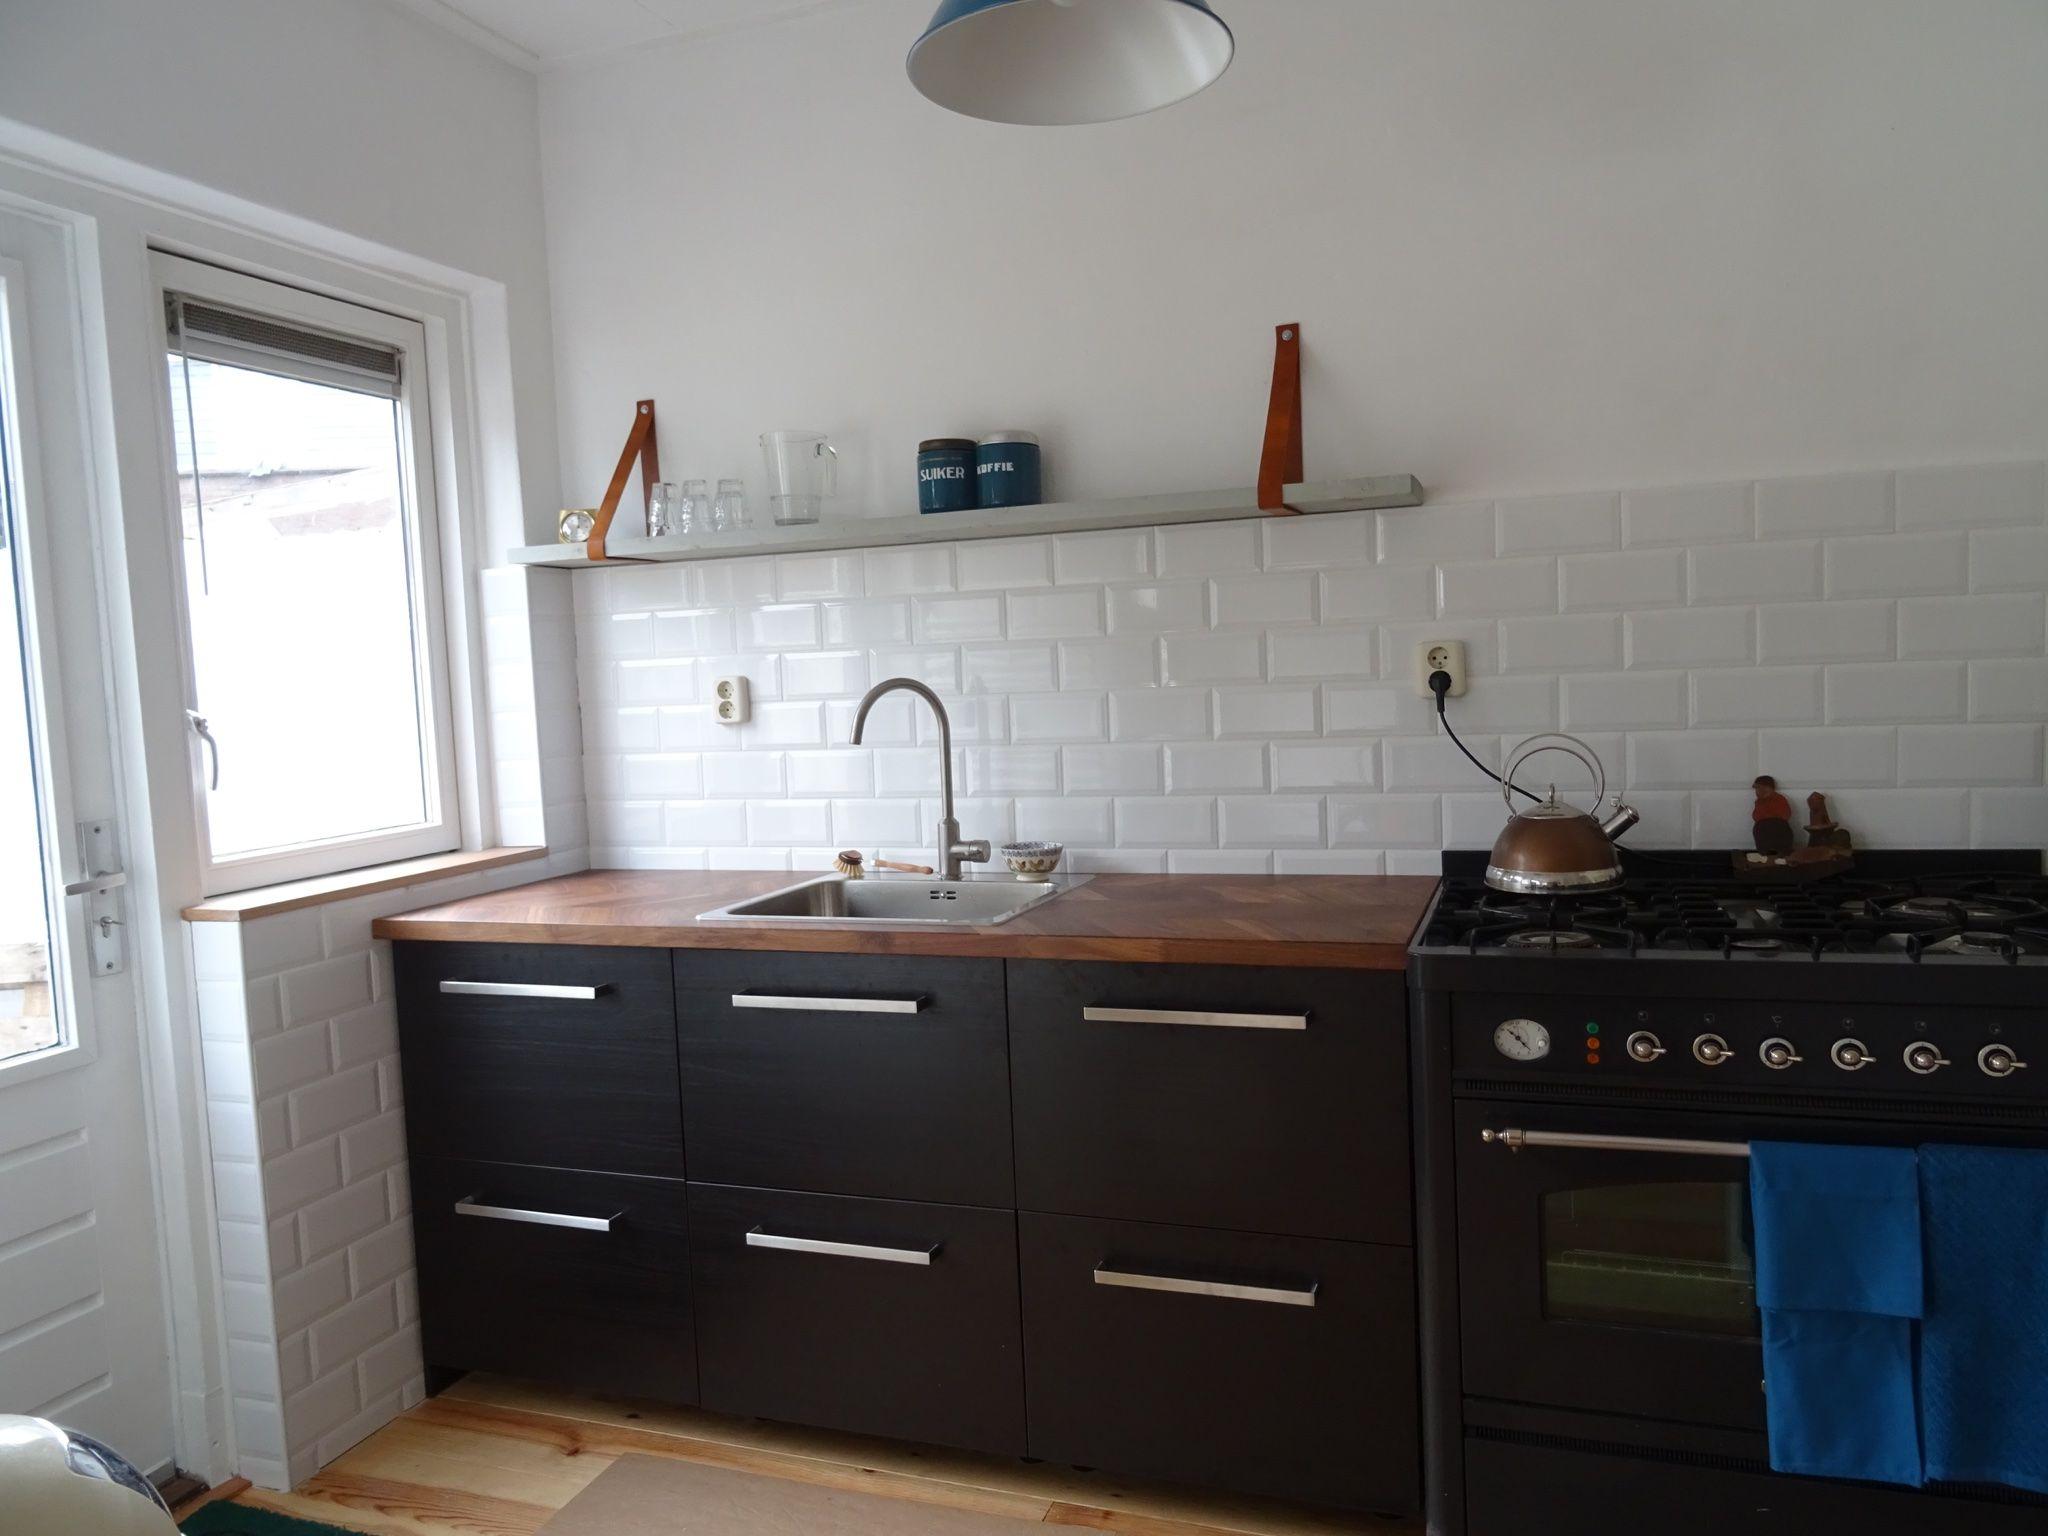 pin by nikki trussell on new home pinterest countertops kitchen rh pinterest co uk